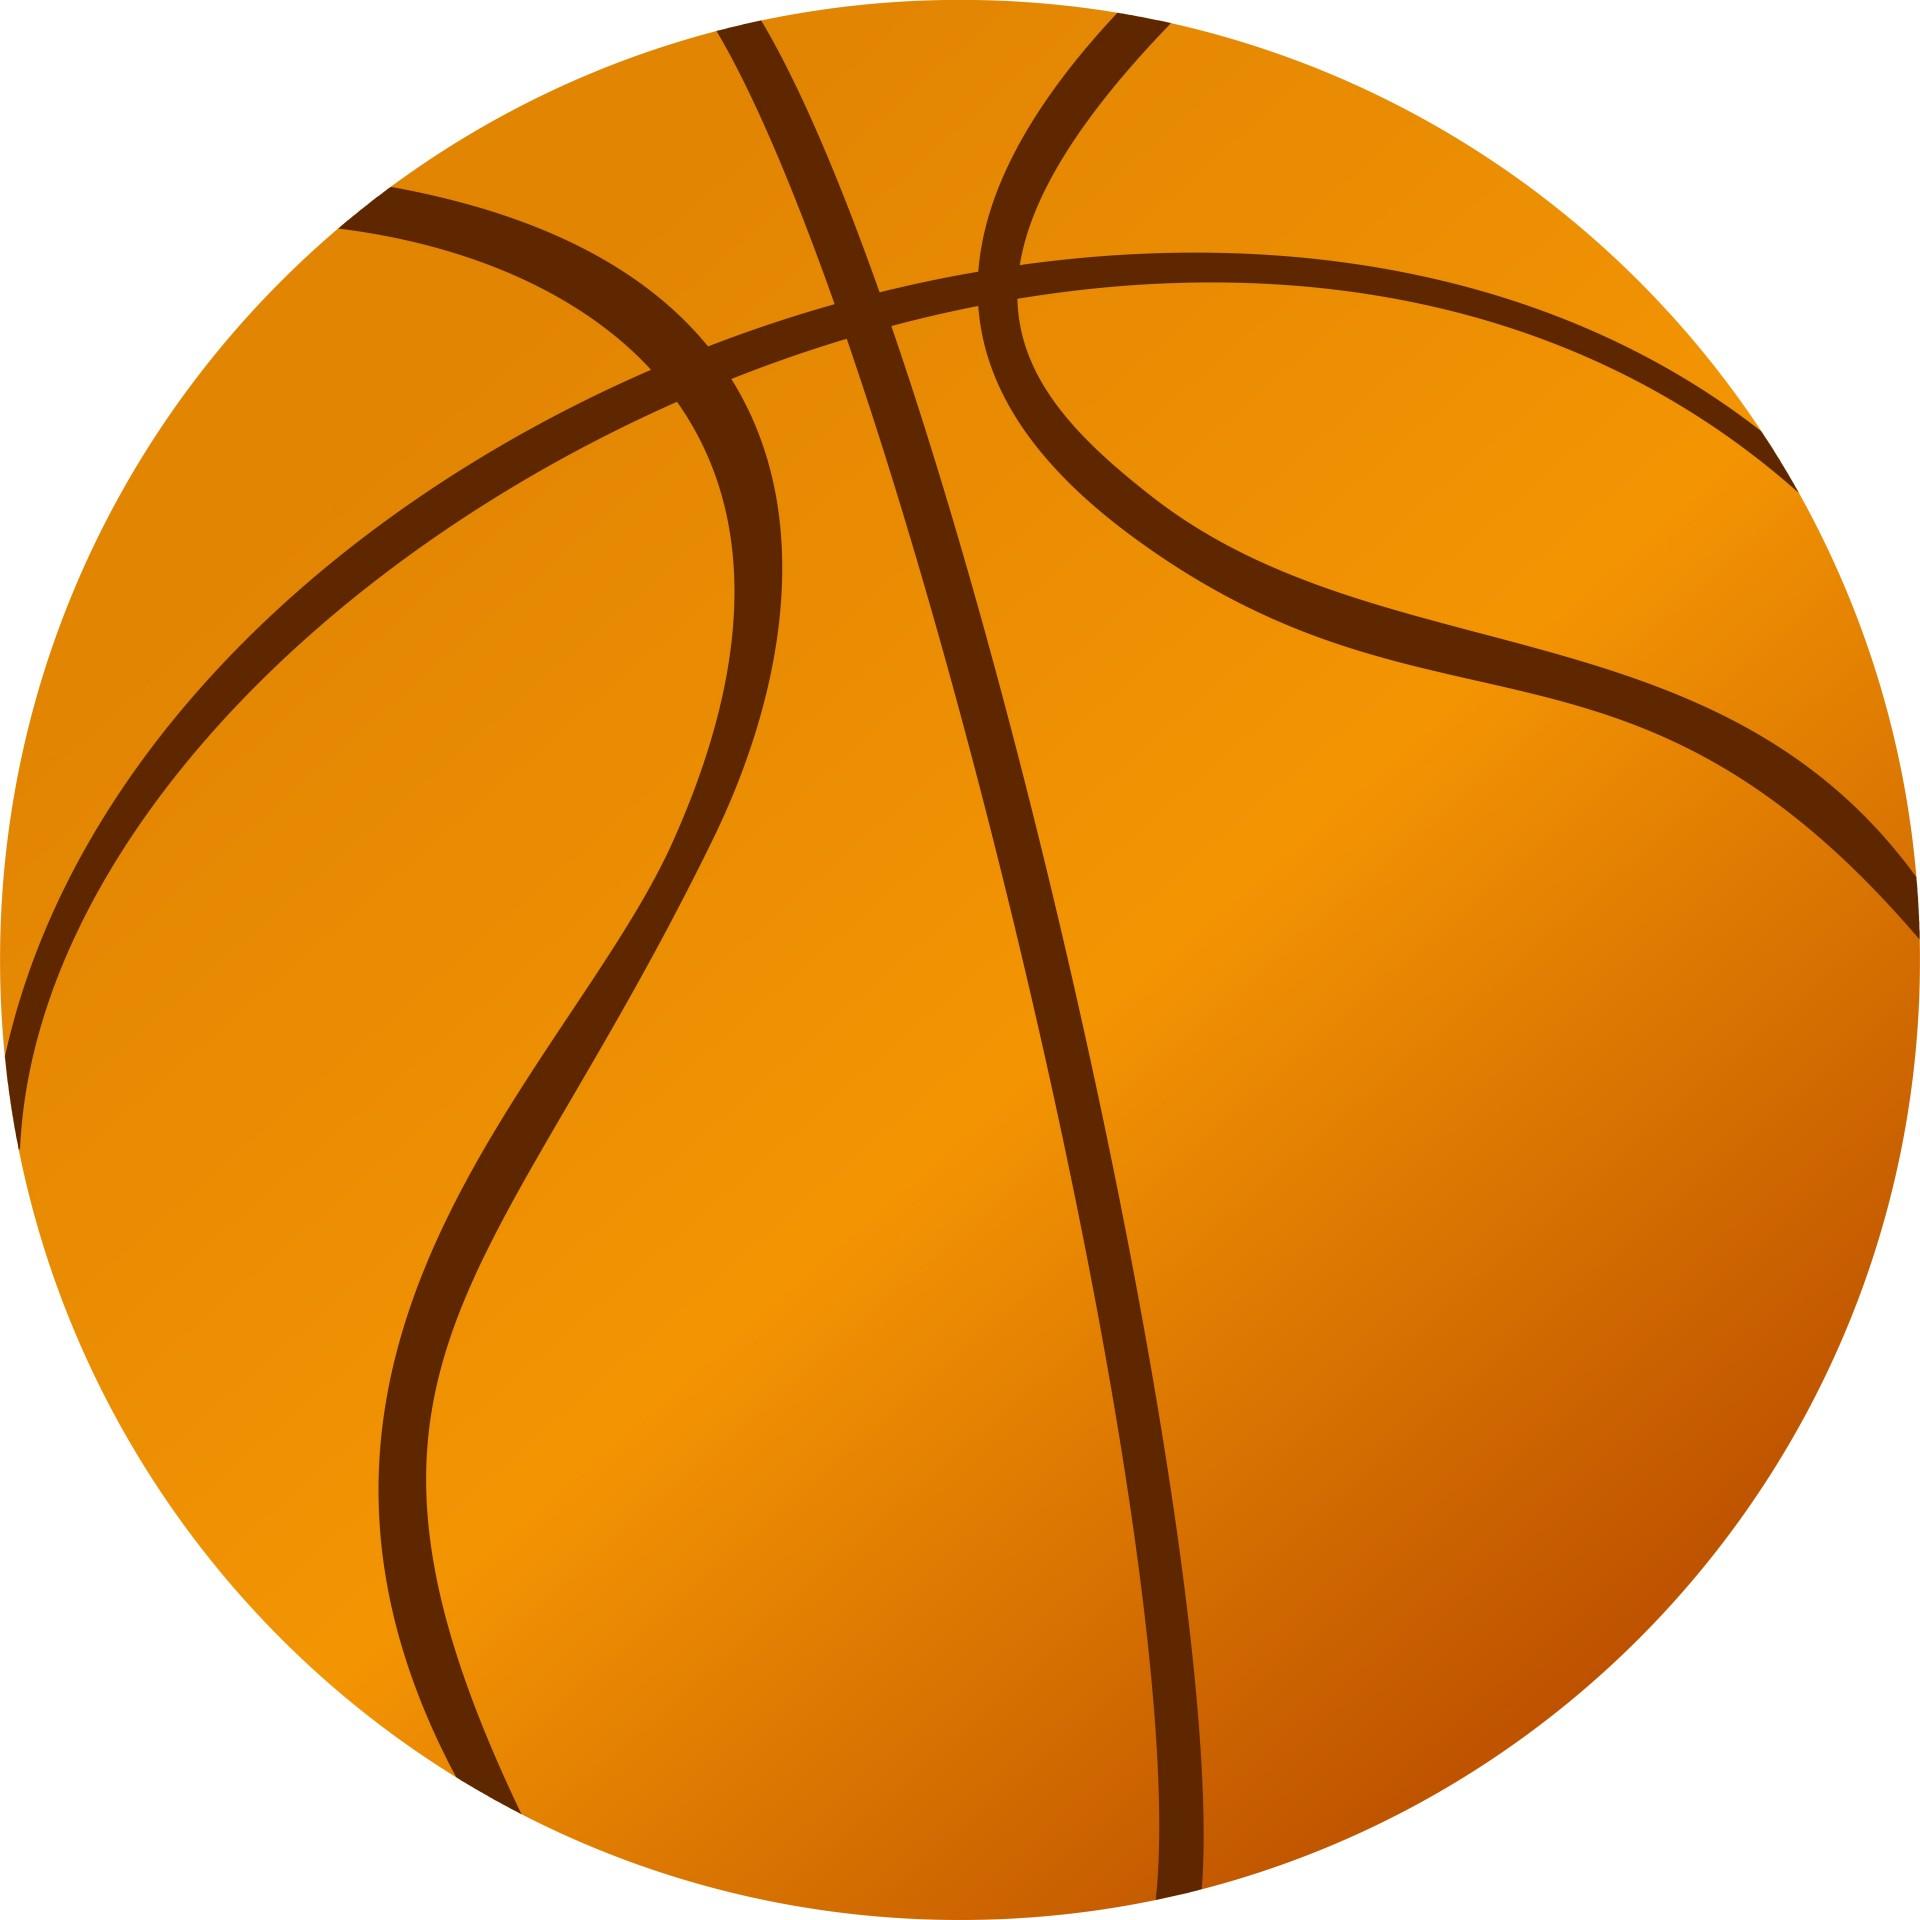 nba basketball clipart at getdrawings com free for personal use rh getdrawings com basketball clipart free black and white basketball clipart free black and white